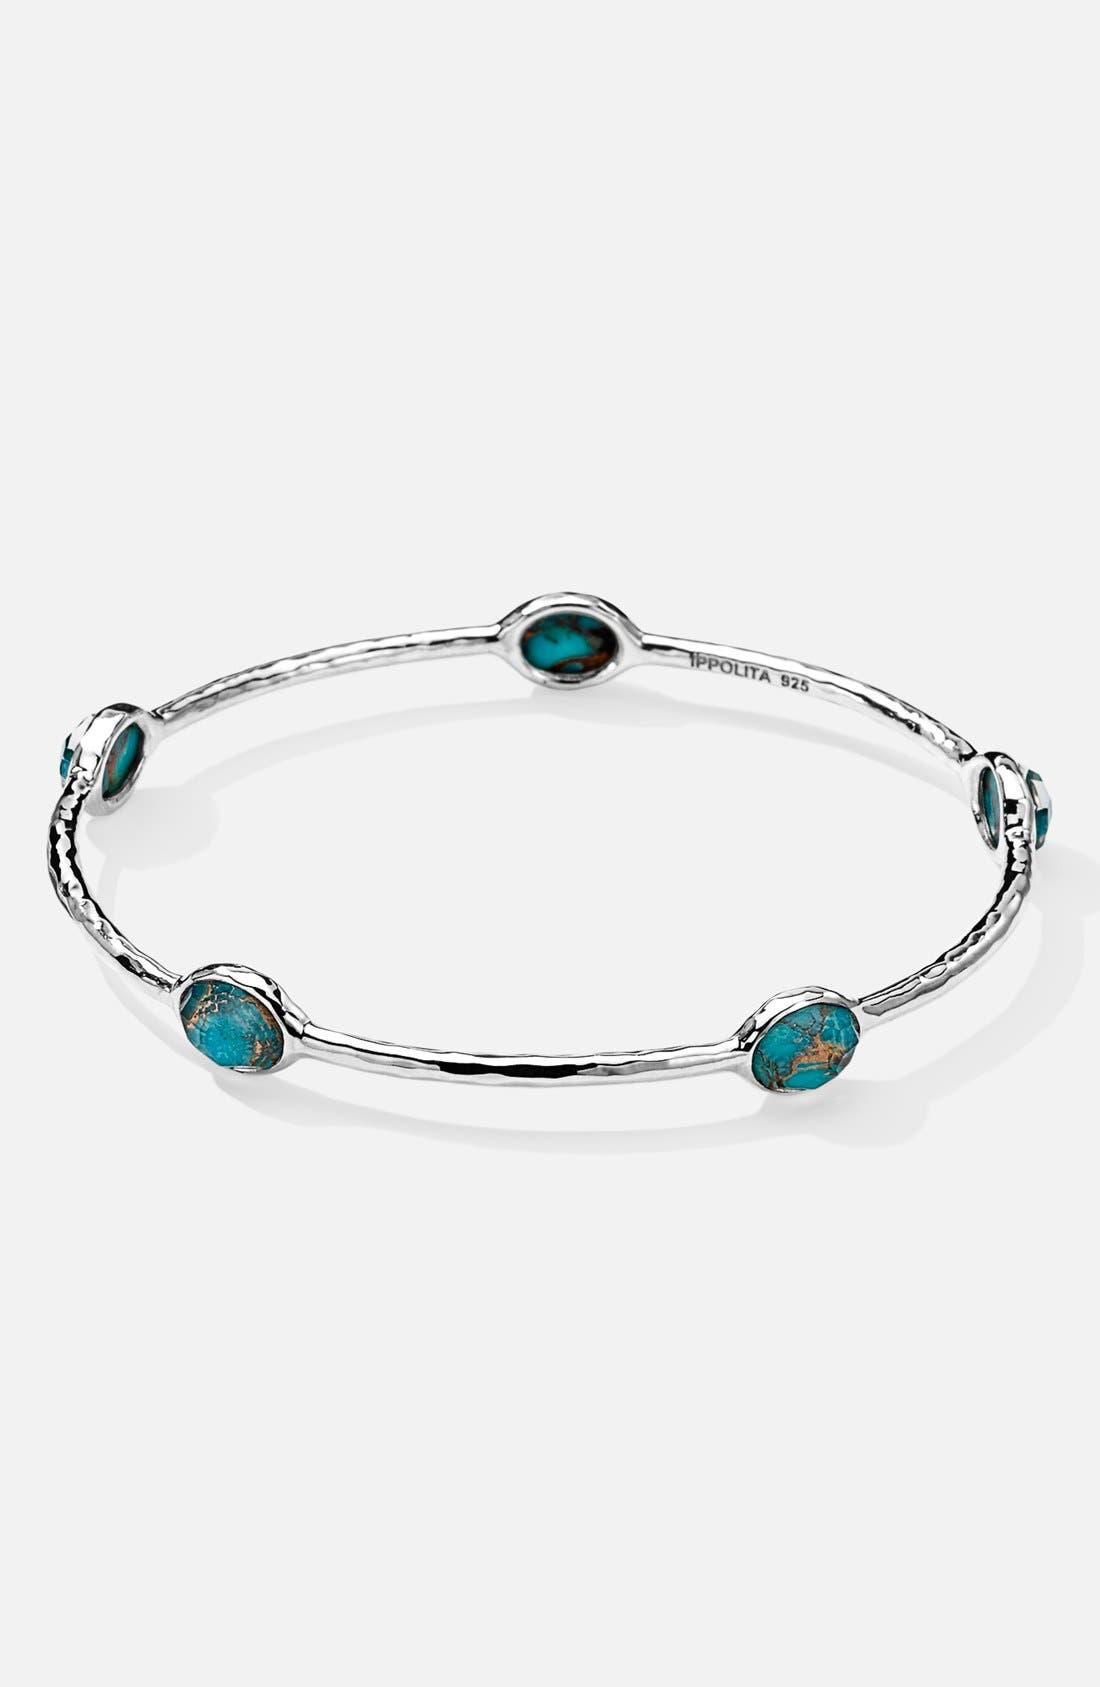 Main Image - Ippolita 'Rock Candy' 5-Stone Blue Topaz Bangle (Online Only)